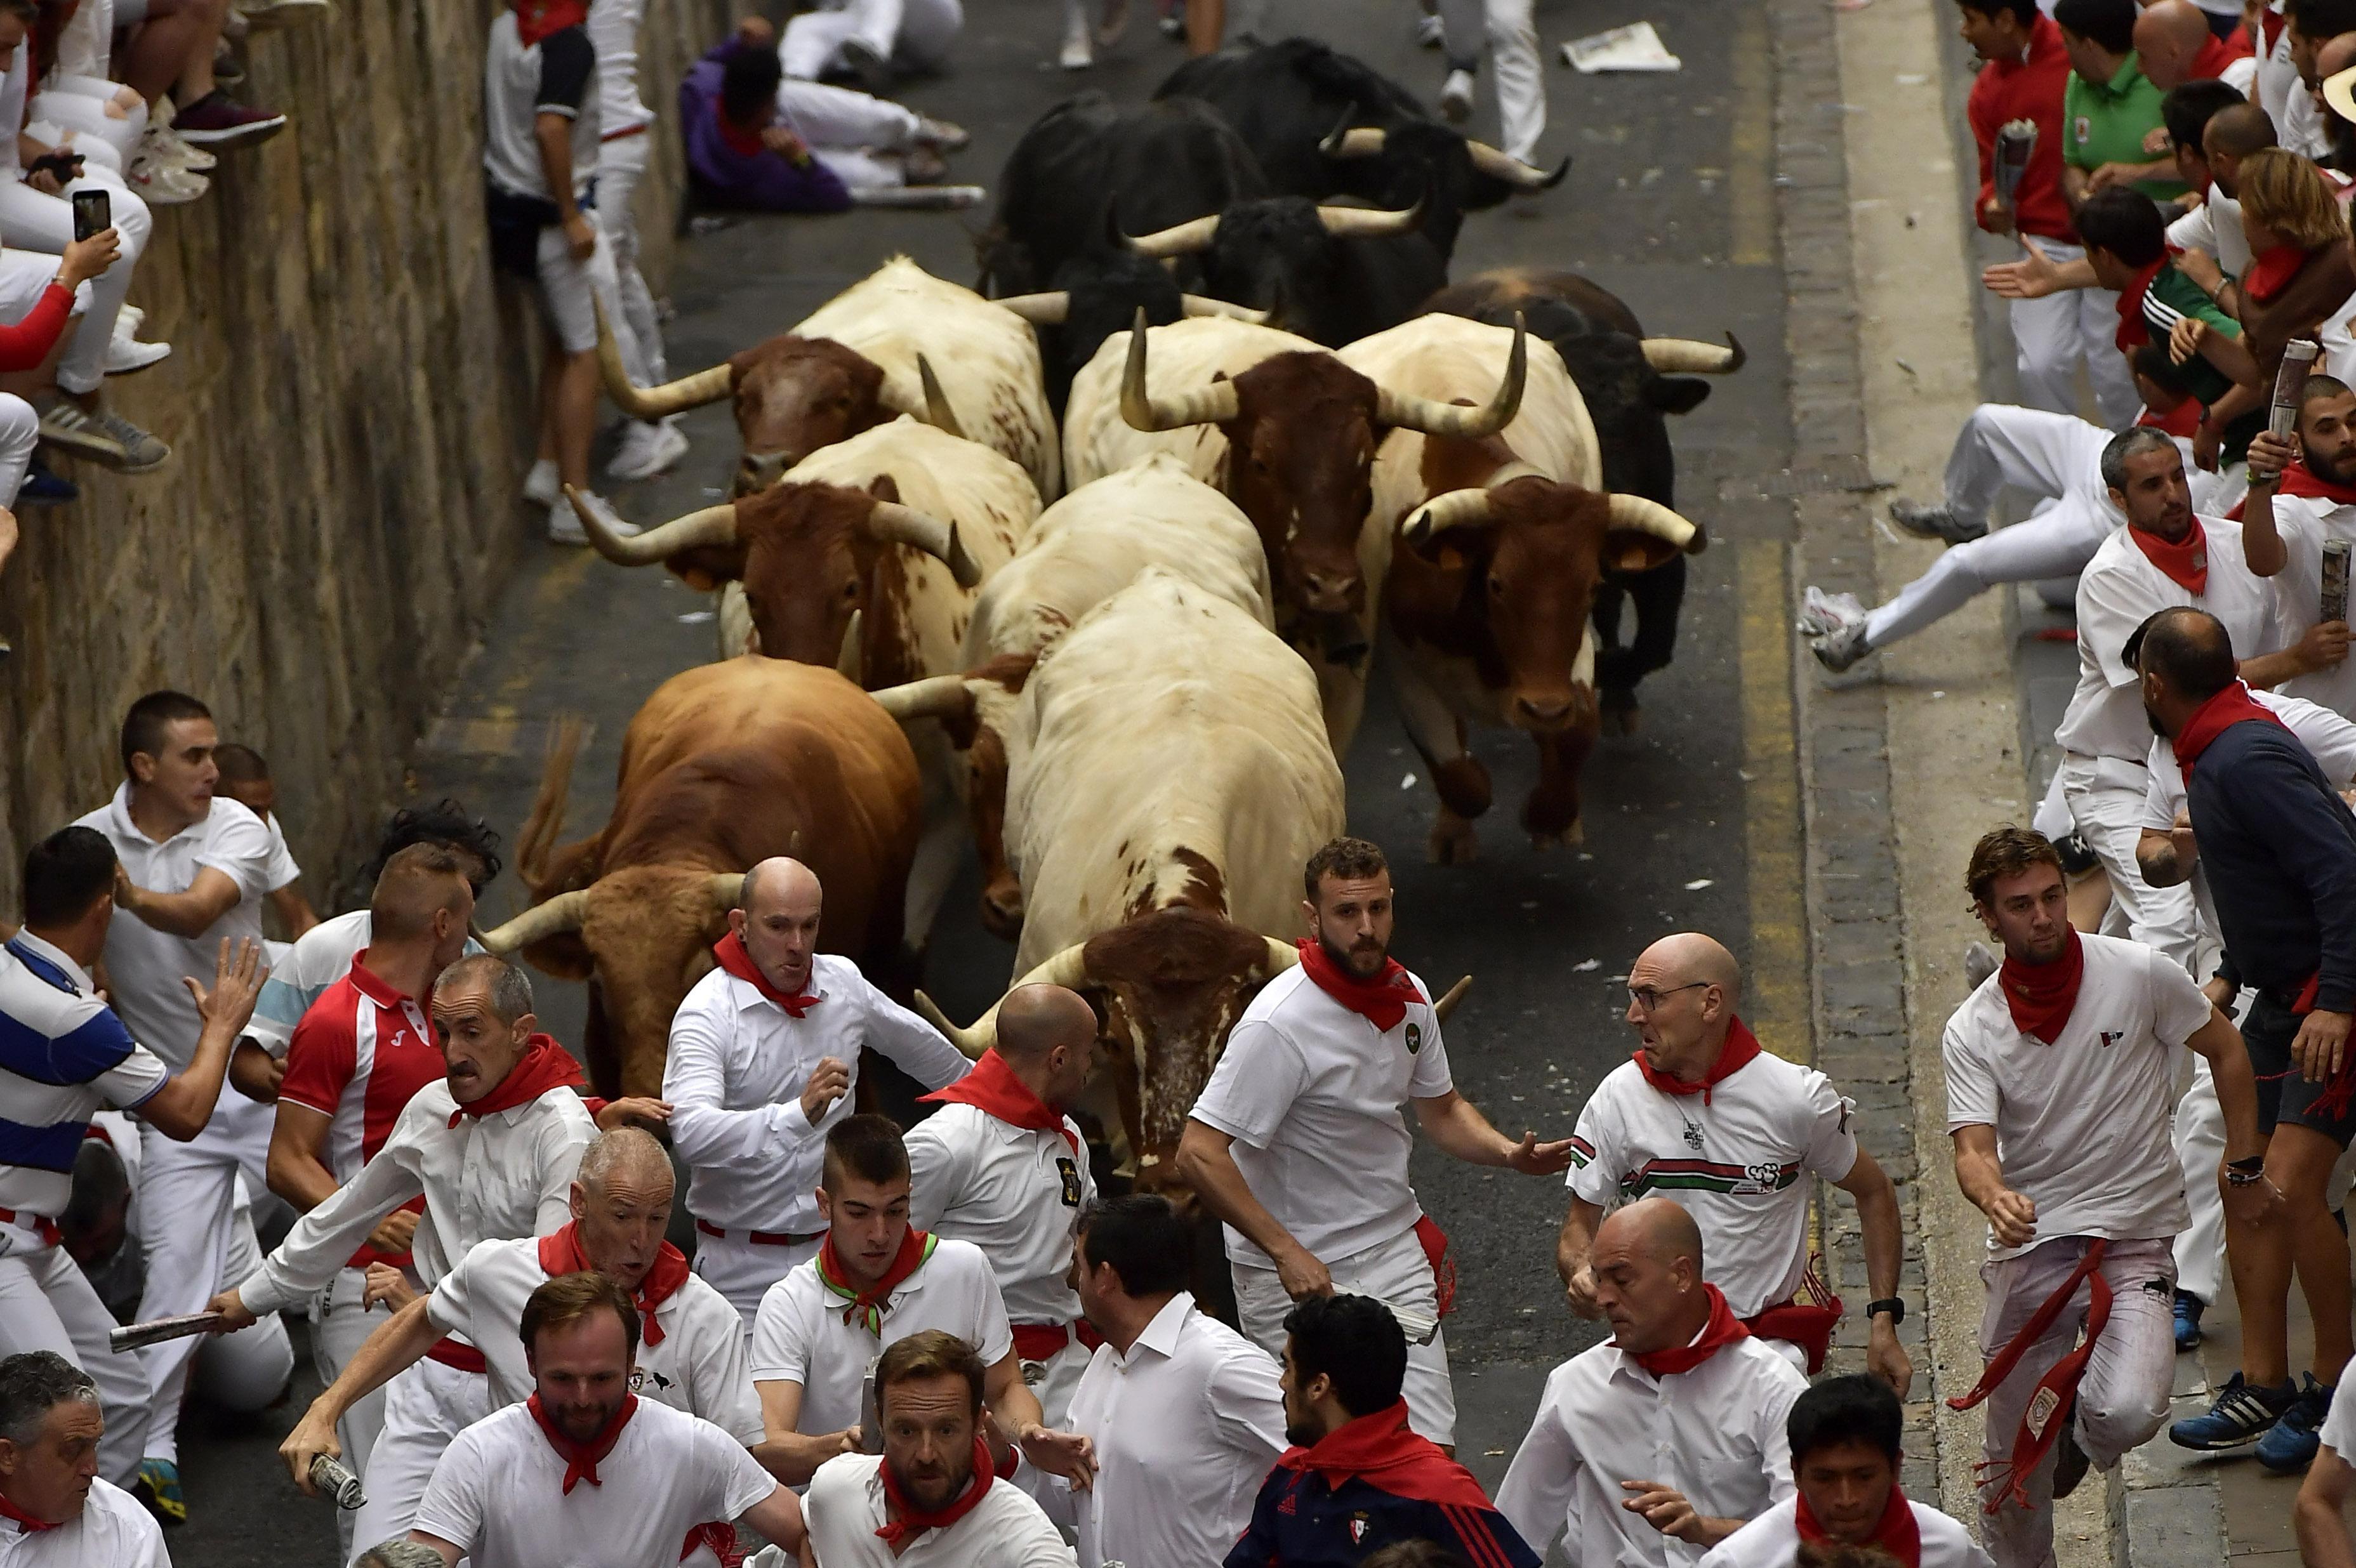 Aaron Froelicher gored during running of the bulls